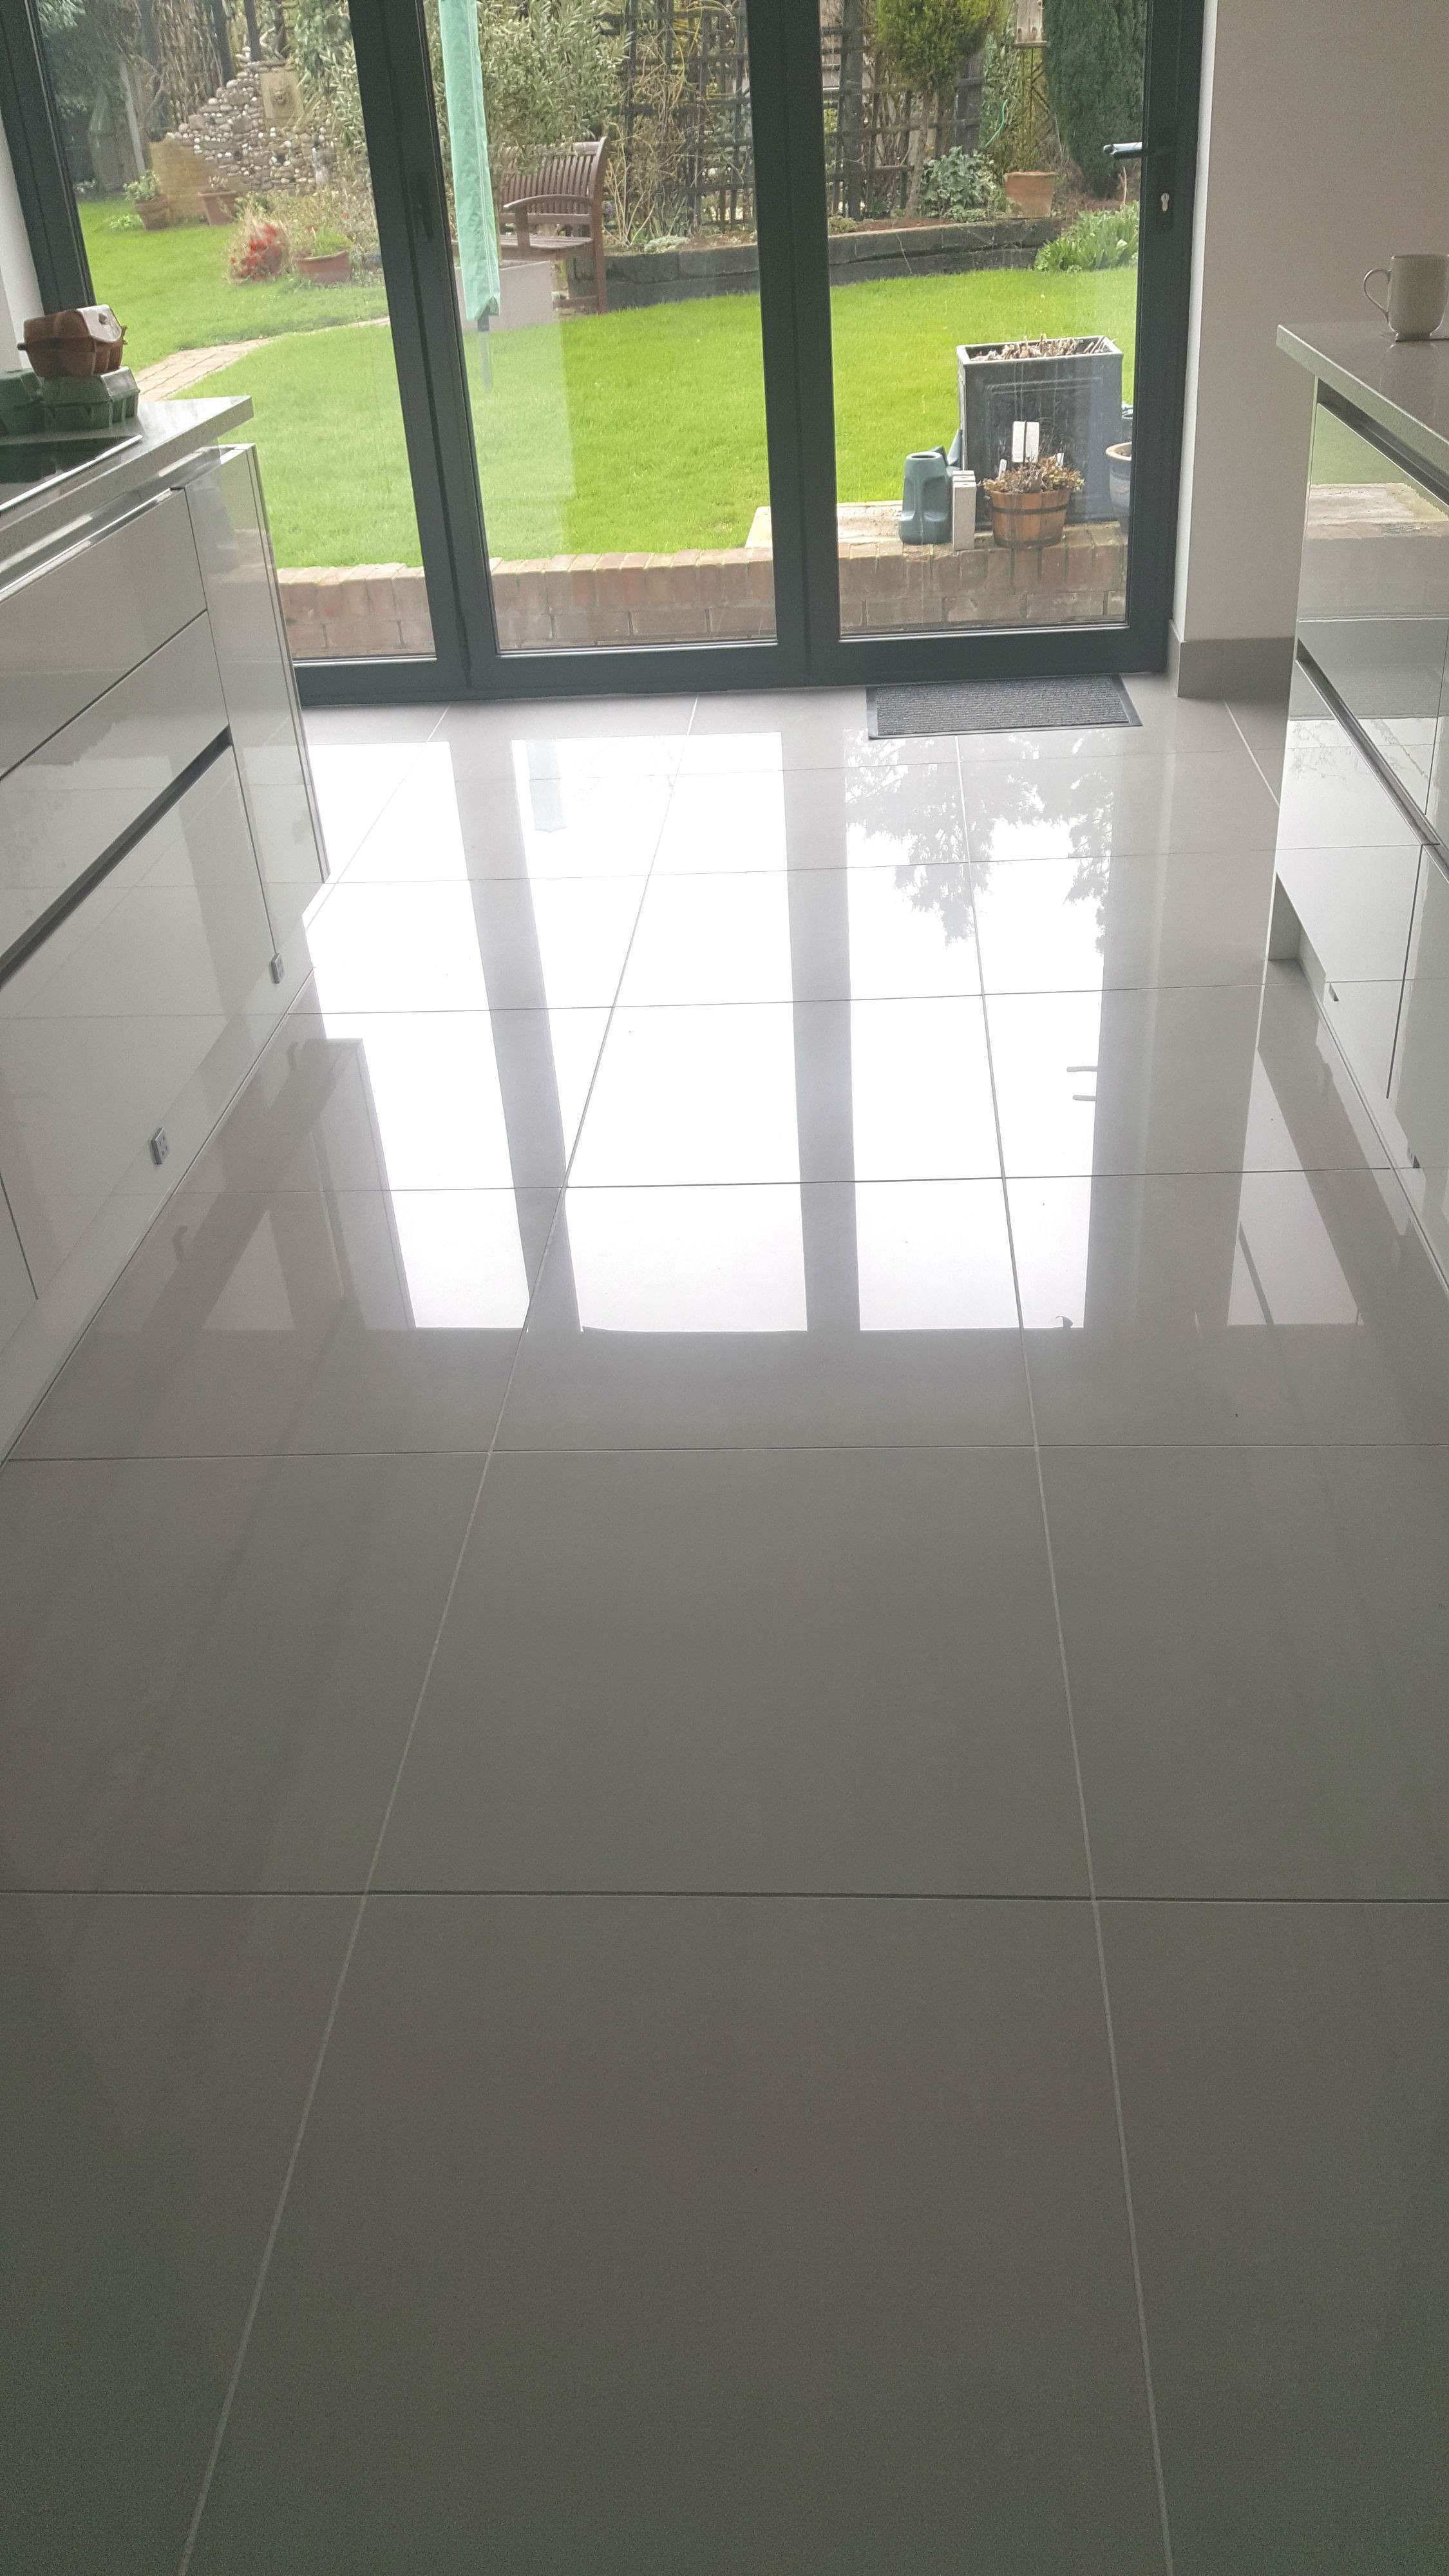 Wickes Arkeisa Gris Polished Porcelain Floor Tile 600x600mm